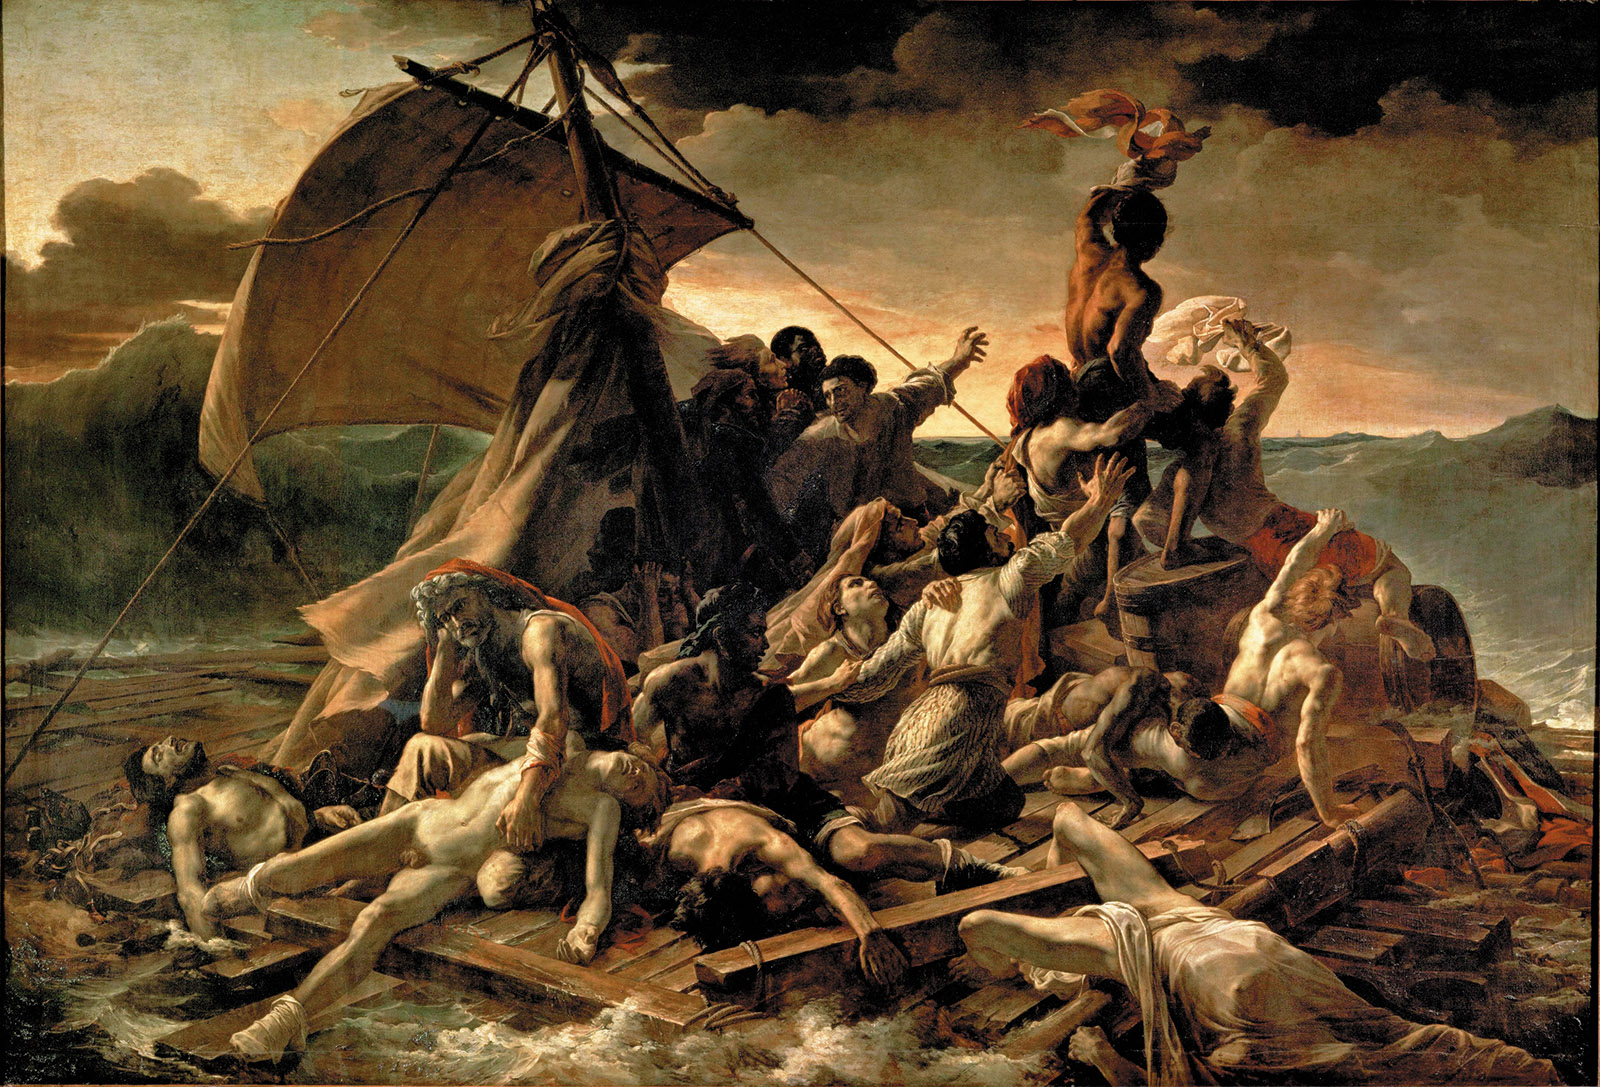 Théodore Géricault: The Raft of the Medusa, 1818–1819